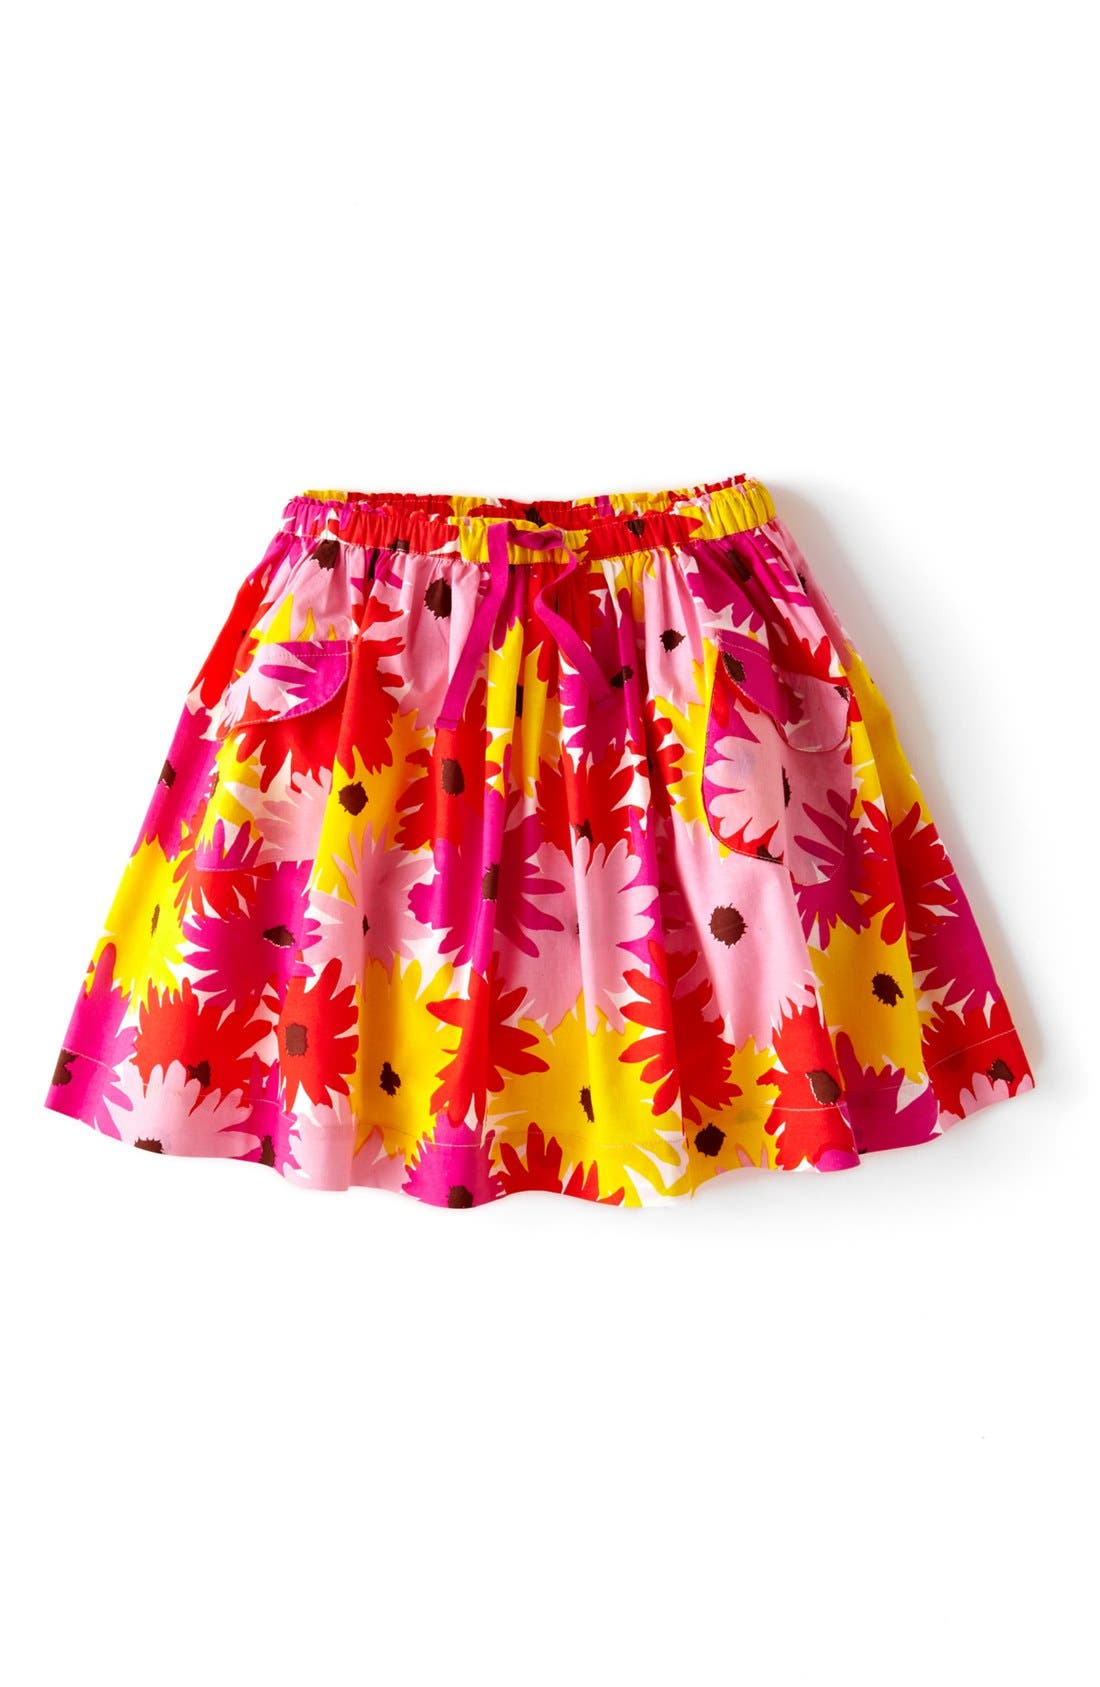 Alternate Image 1 Selected - Mini Boden 'Fun' Print Circle Skirt (Toddler Girls, Little Girls & Big Girls)